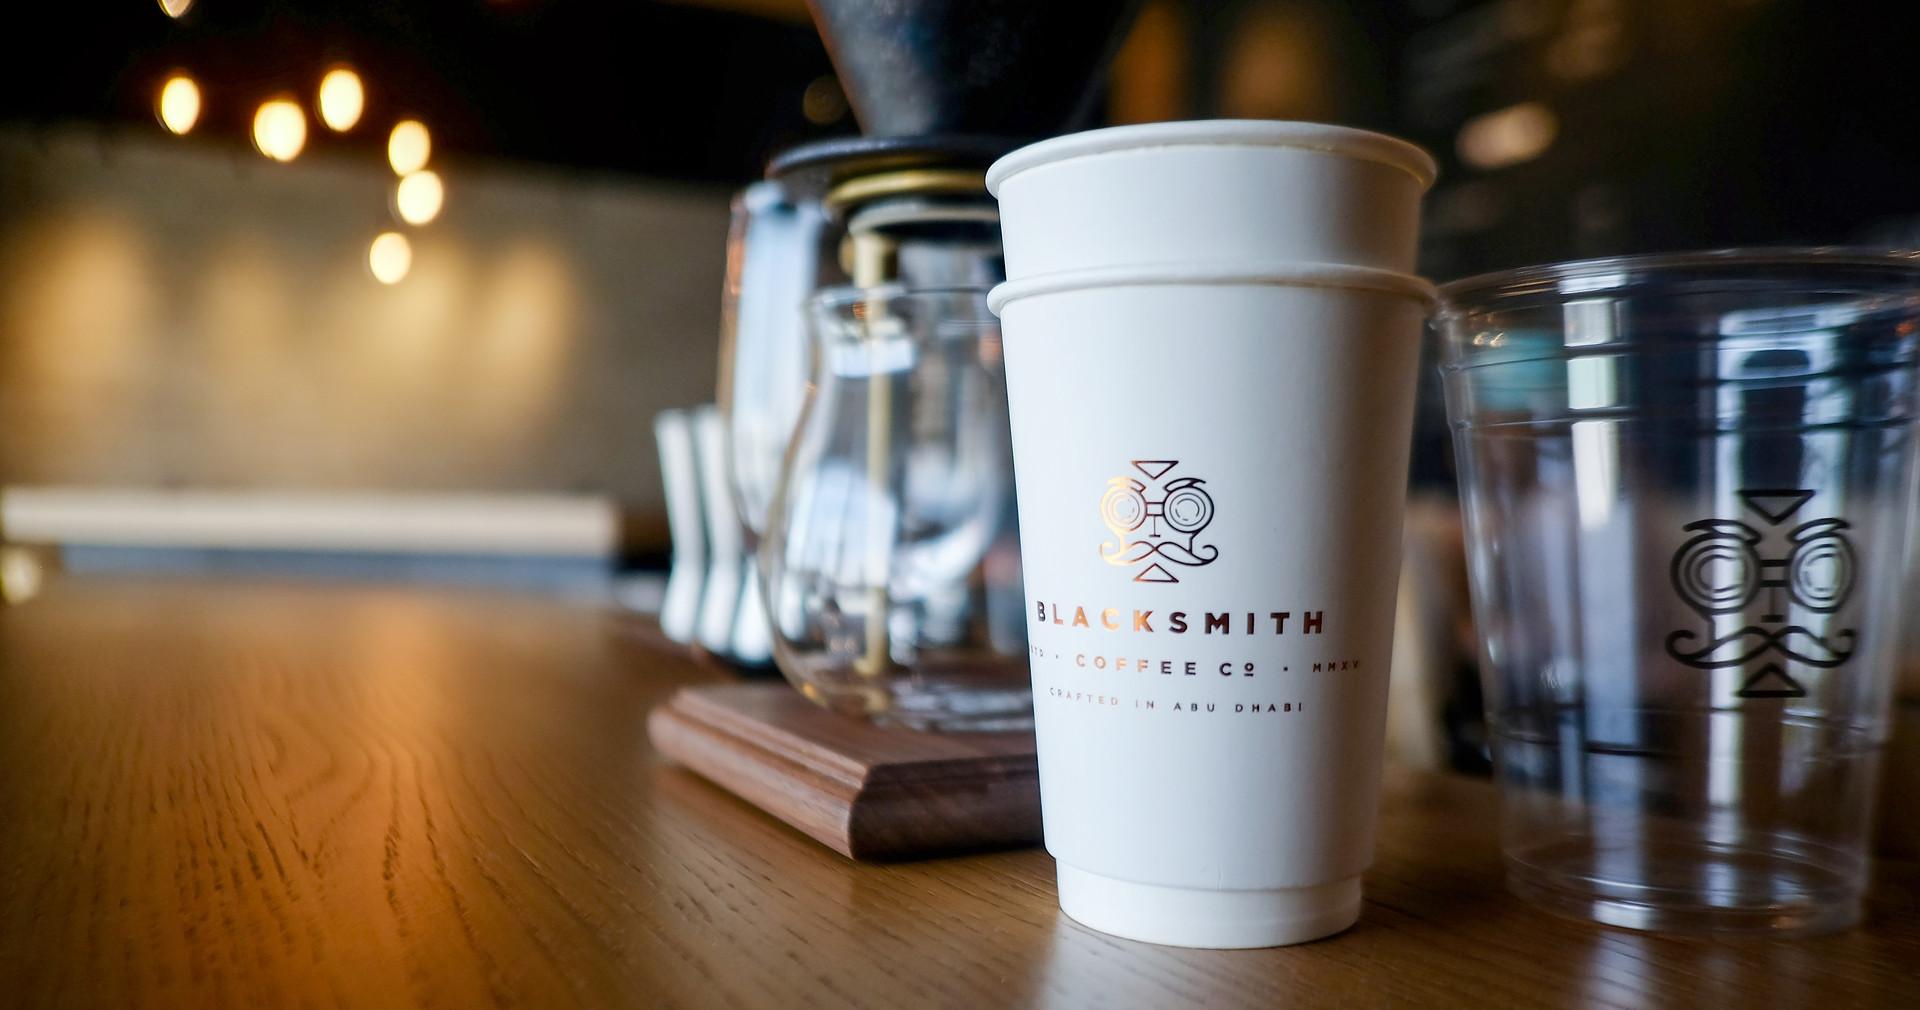 Blacksmith_Coffee Cup-2.jpg